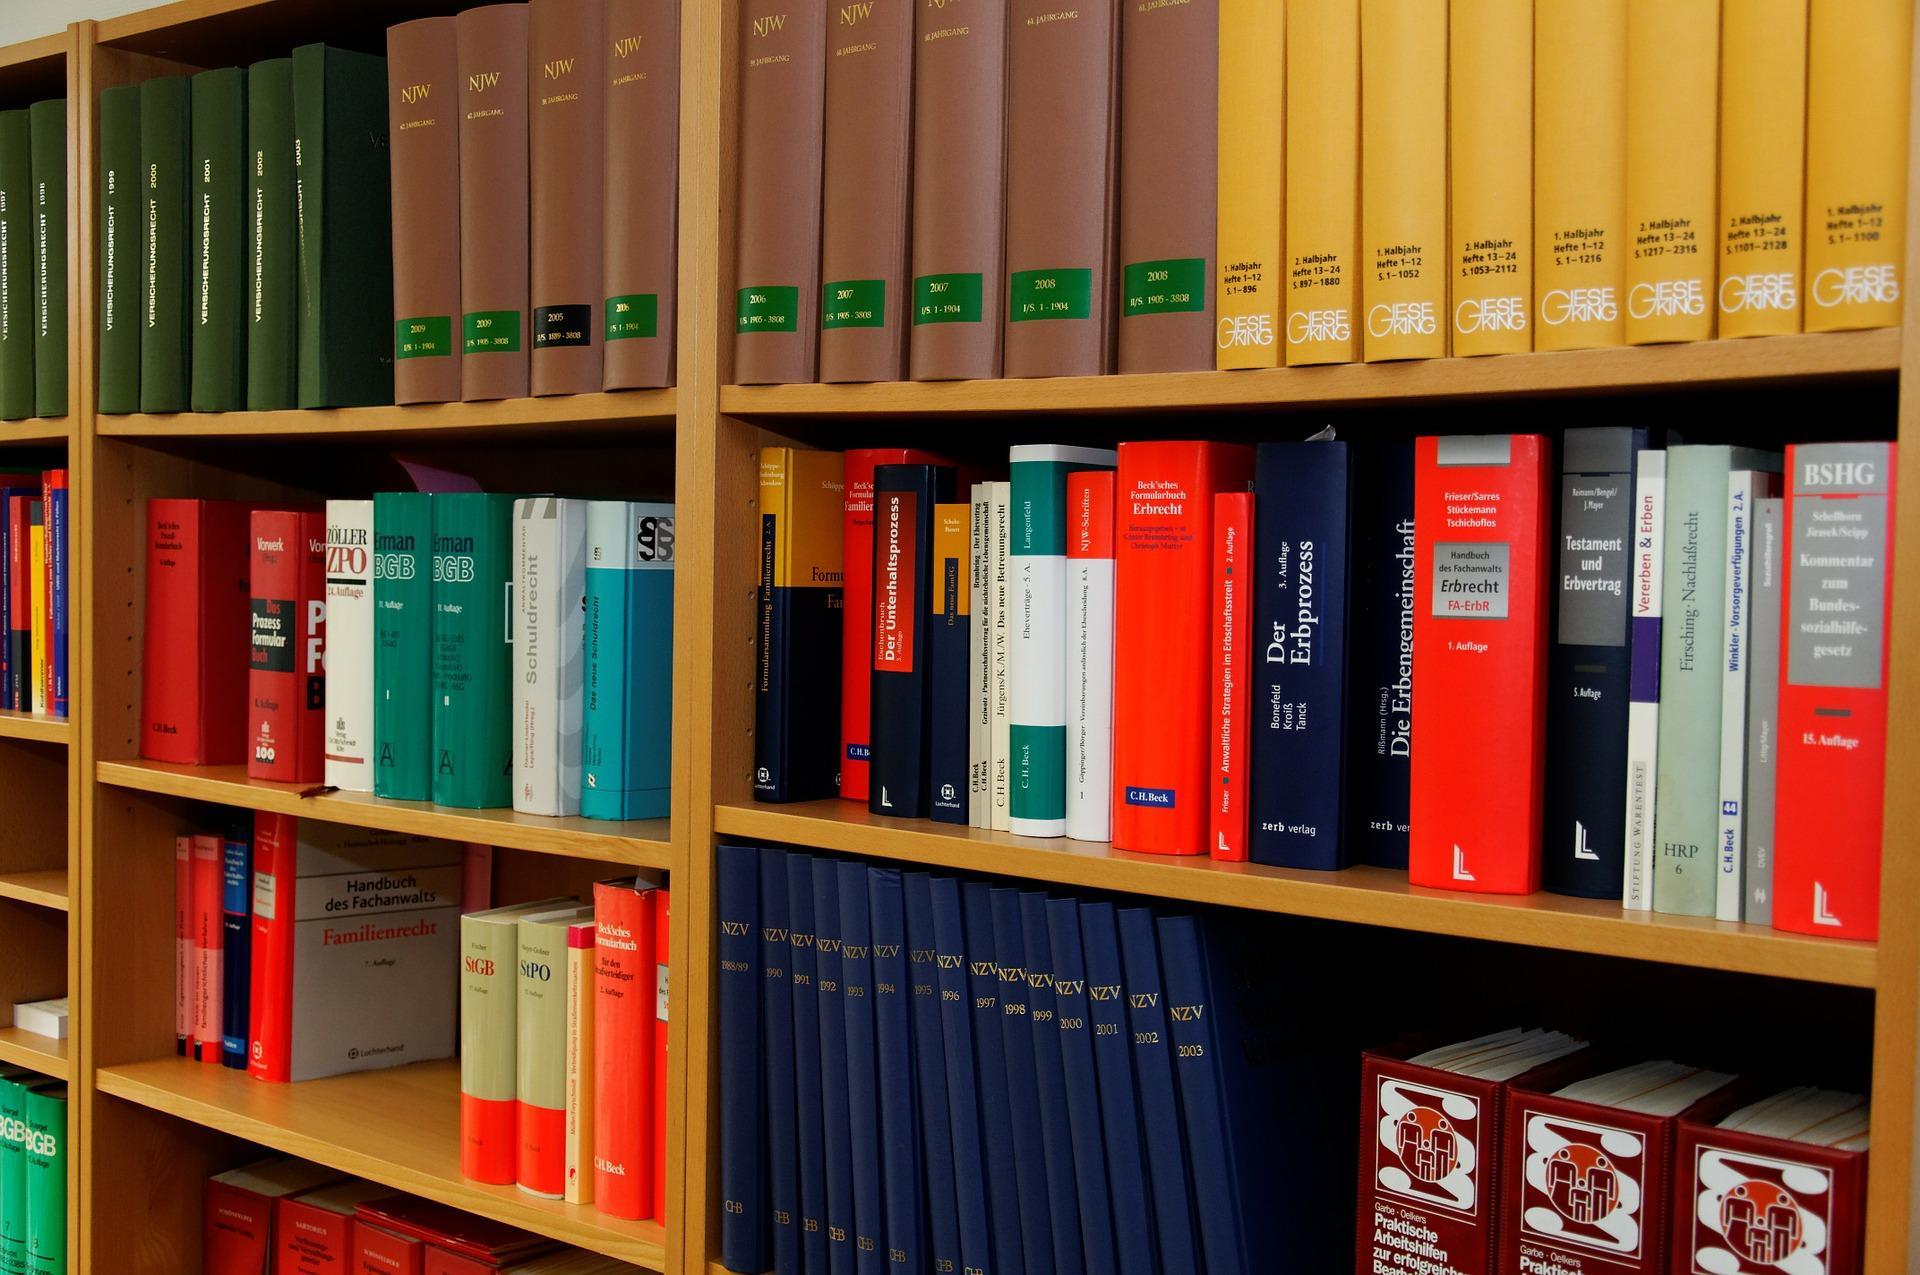 Urheberrechtsabgabe per Gesamtvertrag fürs Hochschul-Intranet